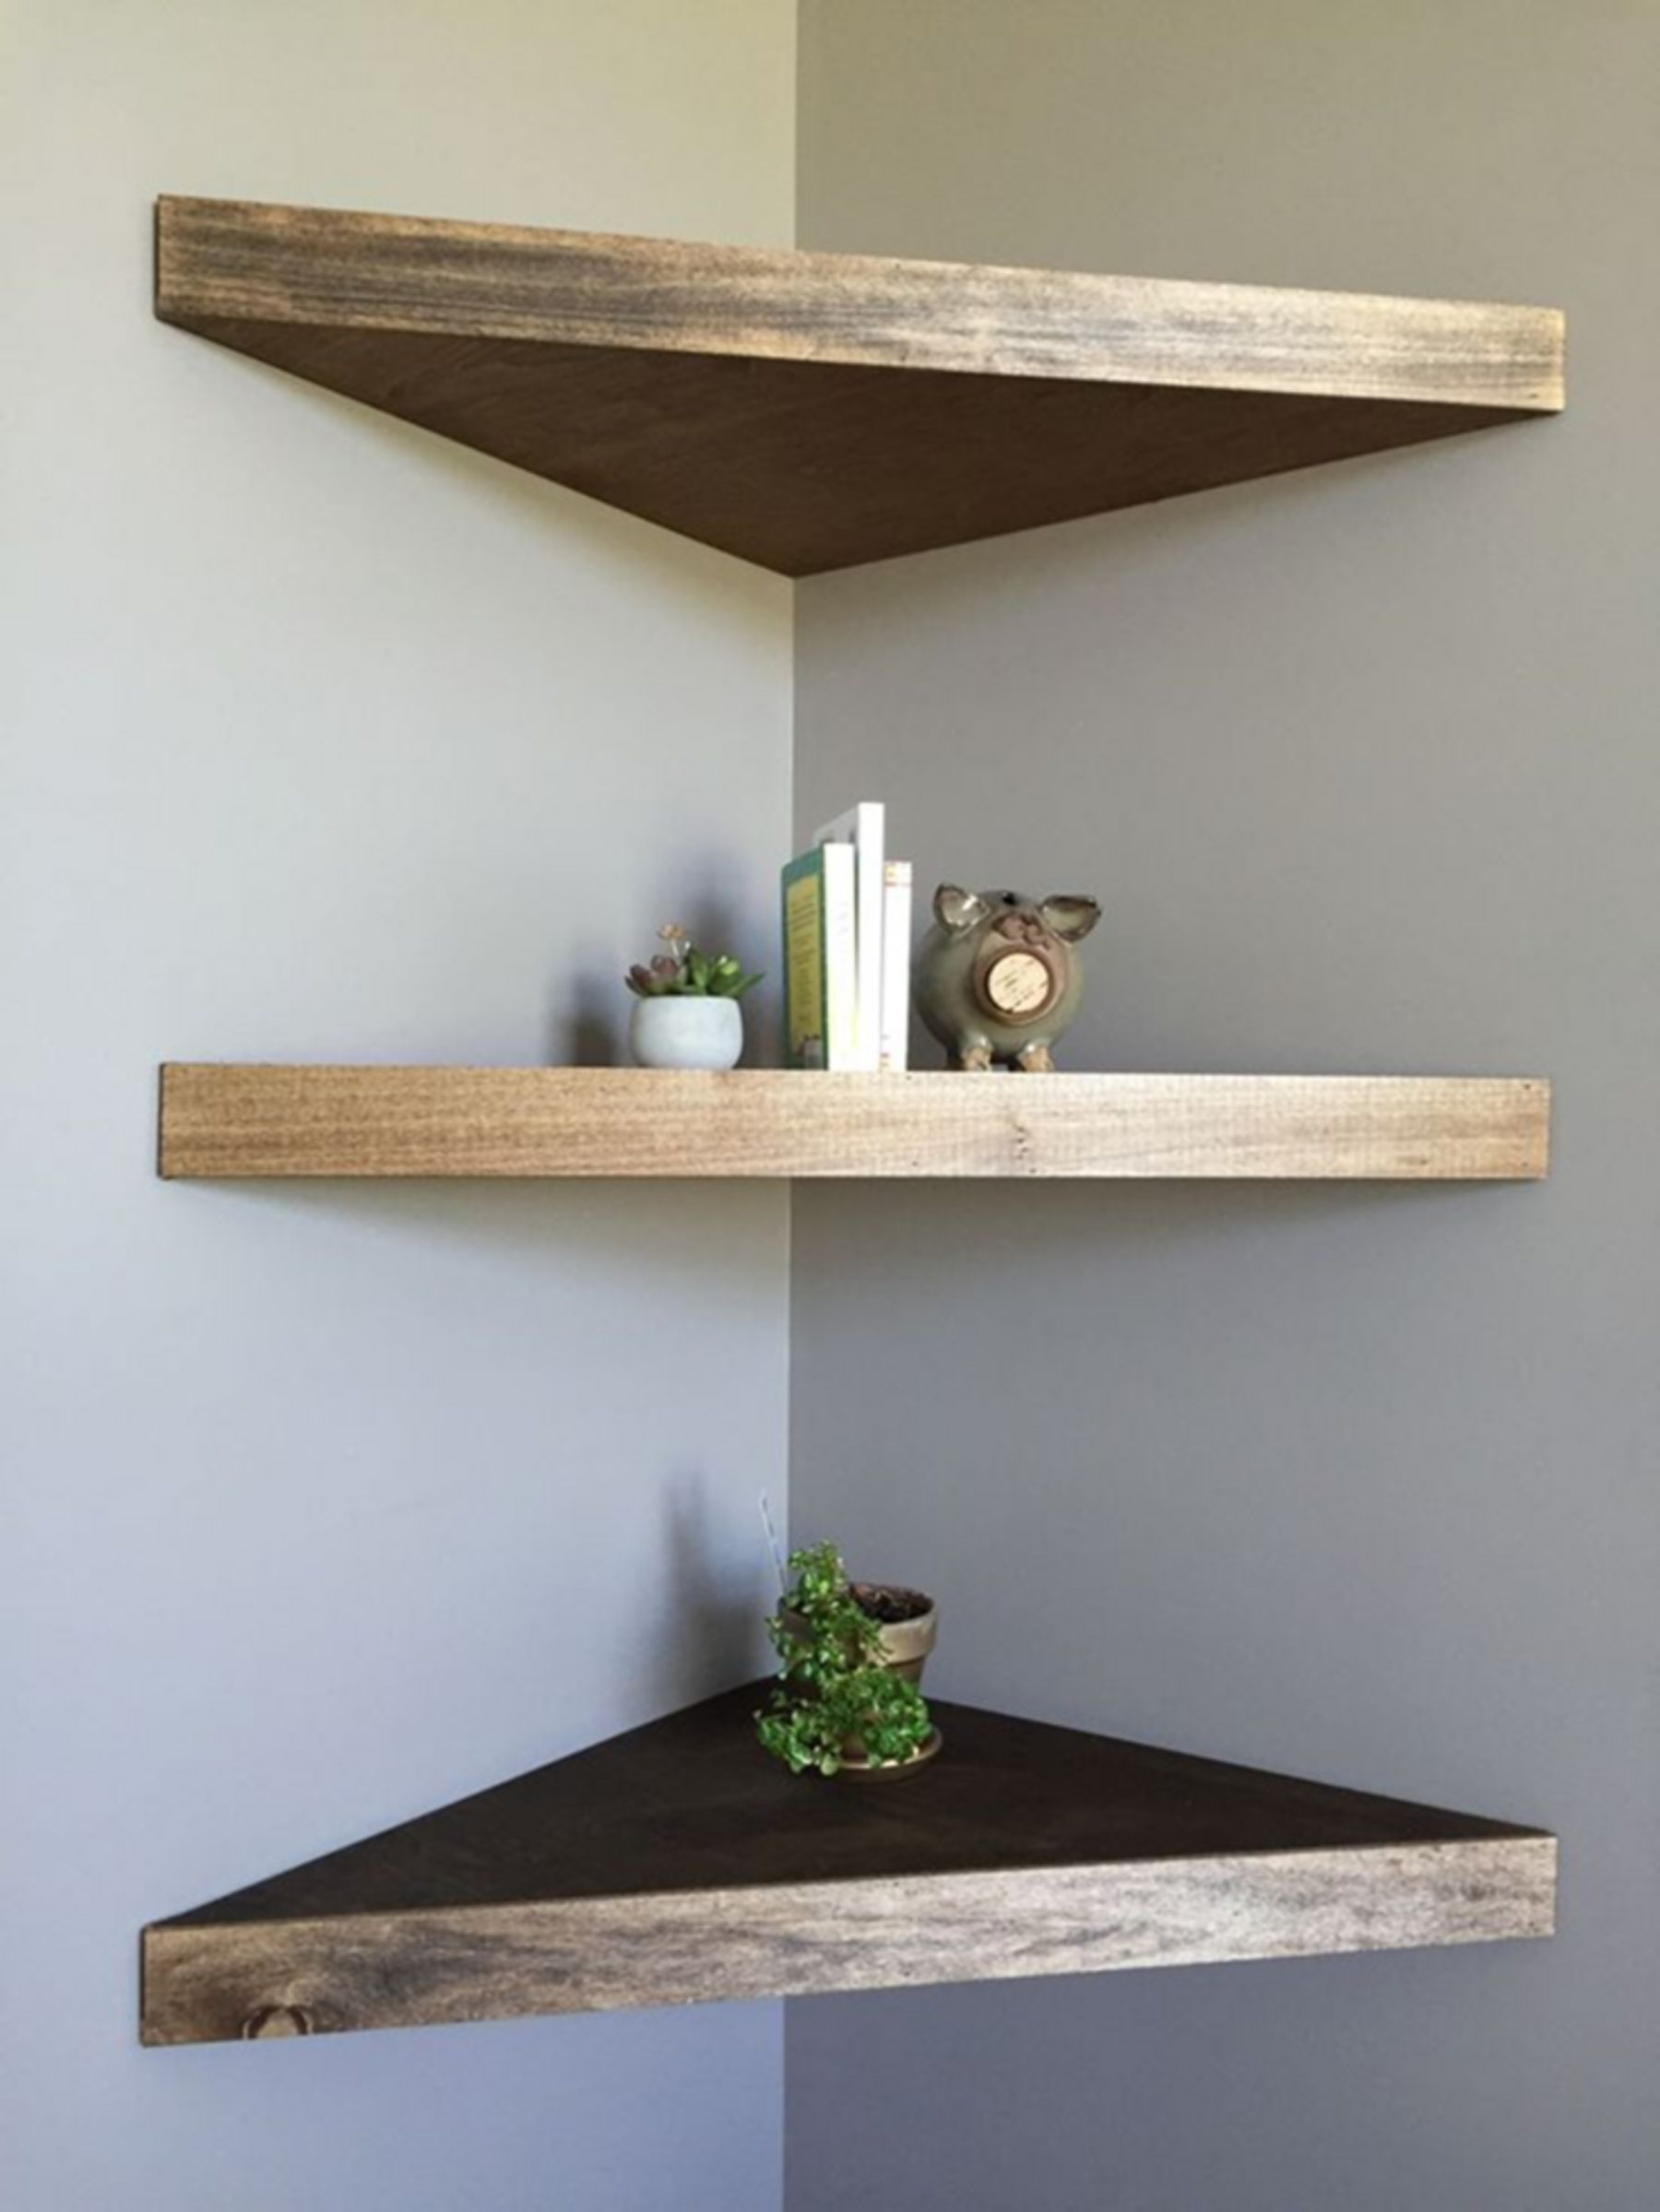 15 Cheap Diy Shelf Design Ideas To Increase The Beauty Of Your Home Interior Beauty Cheap Des In 2020 Wood Corner Shelves Floating Shelves Diy Corner Shelf Design